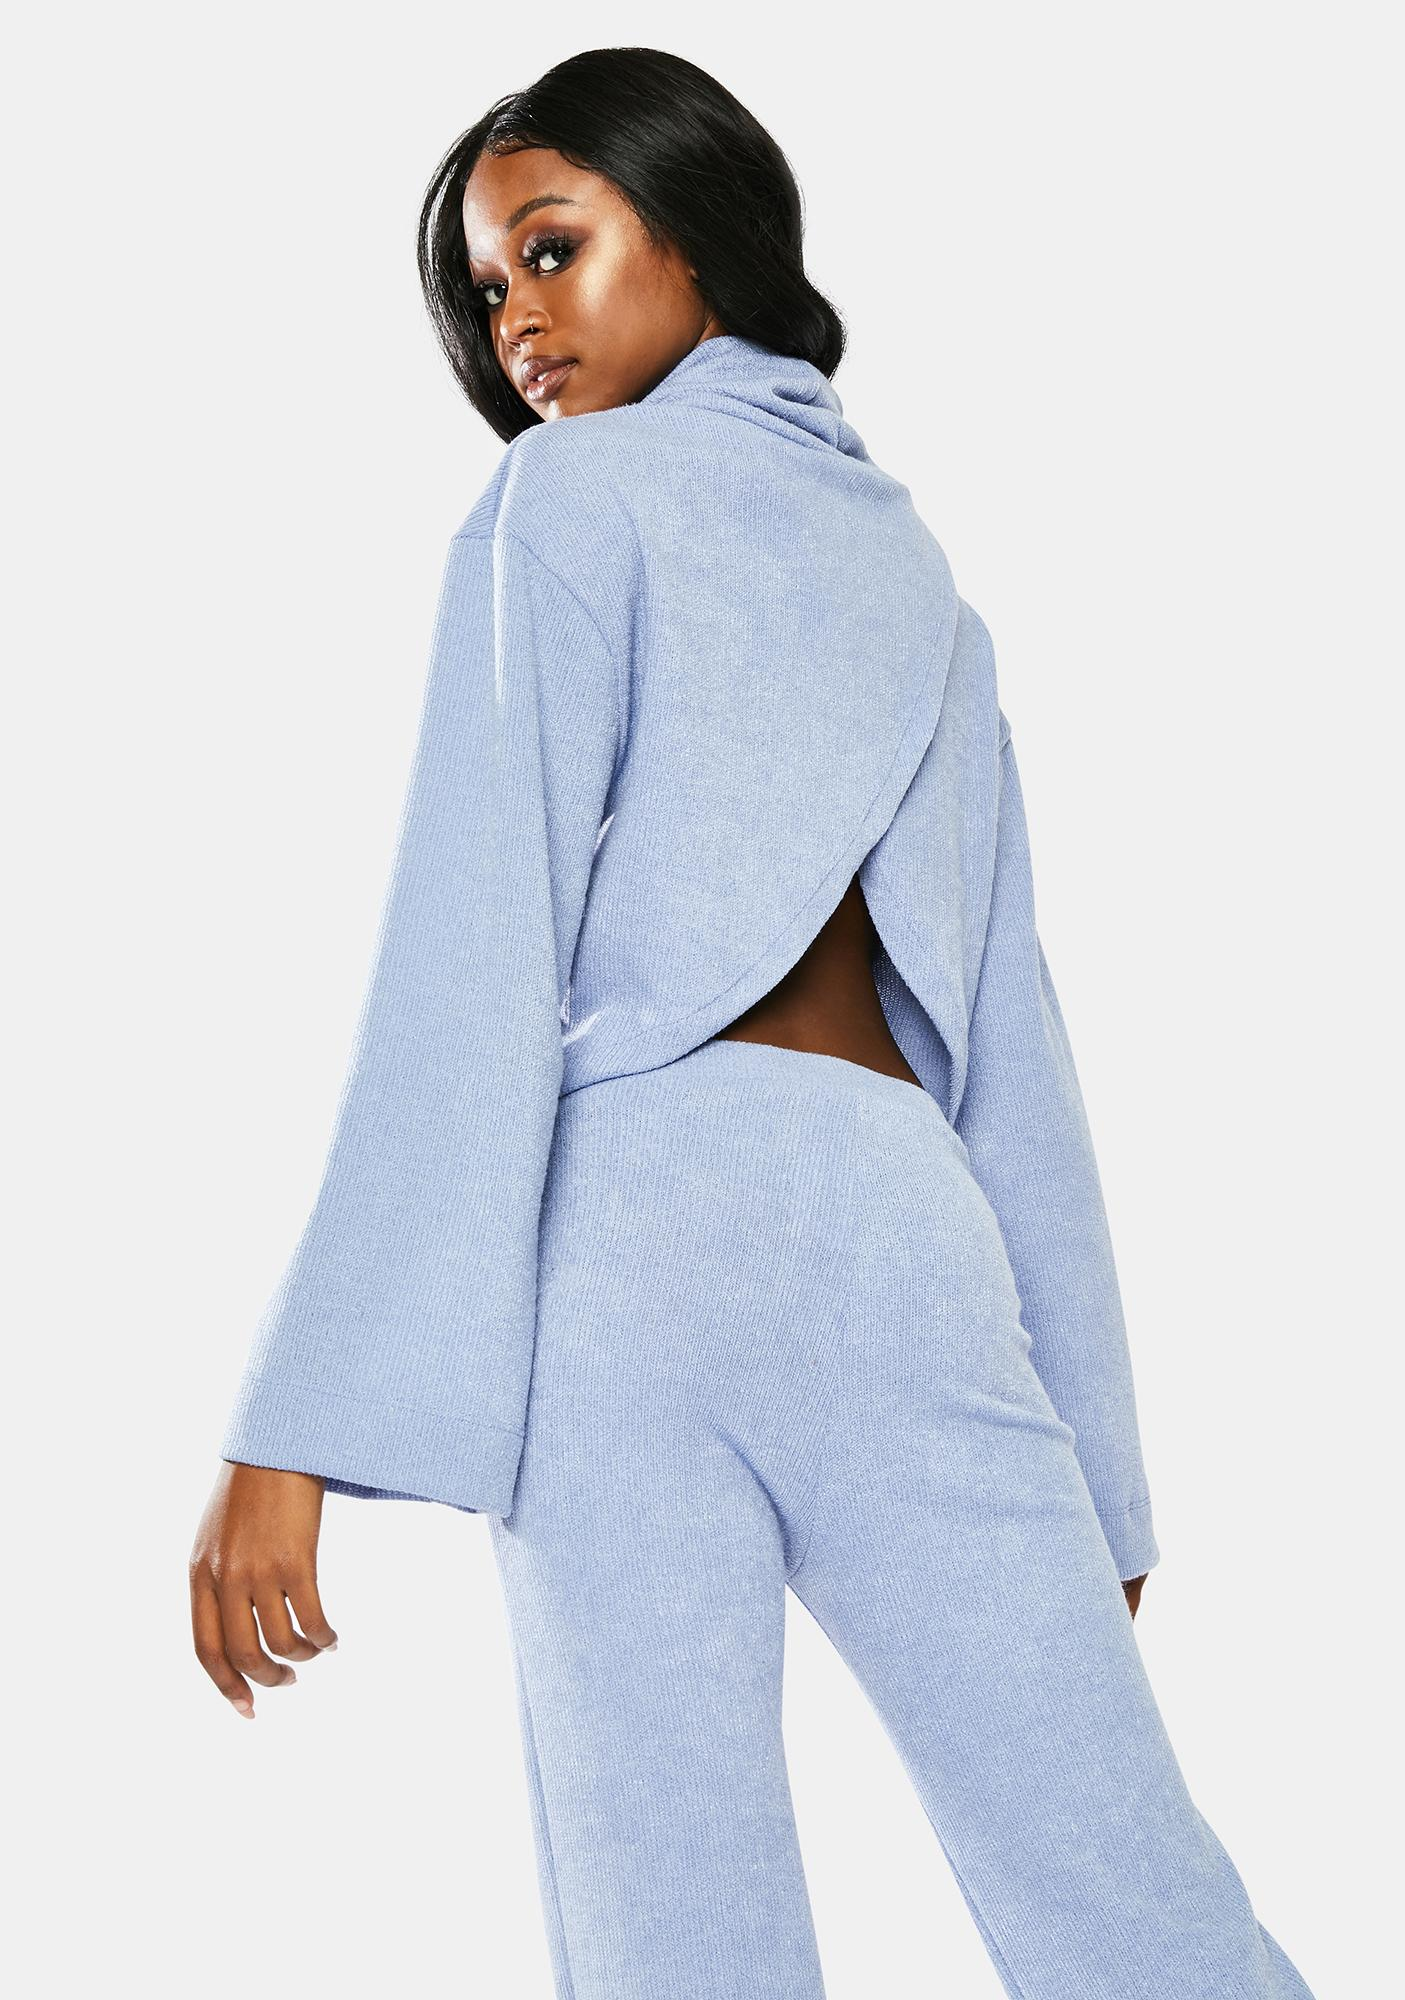 Beautiful Soul Crop Sweater